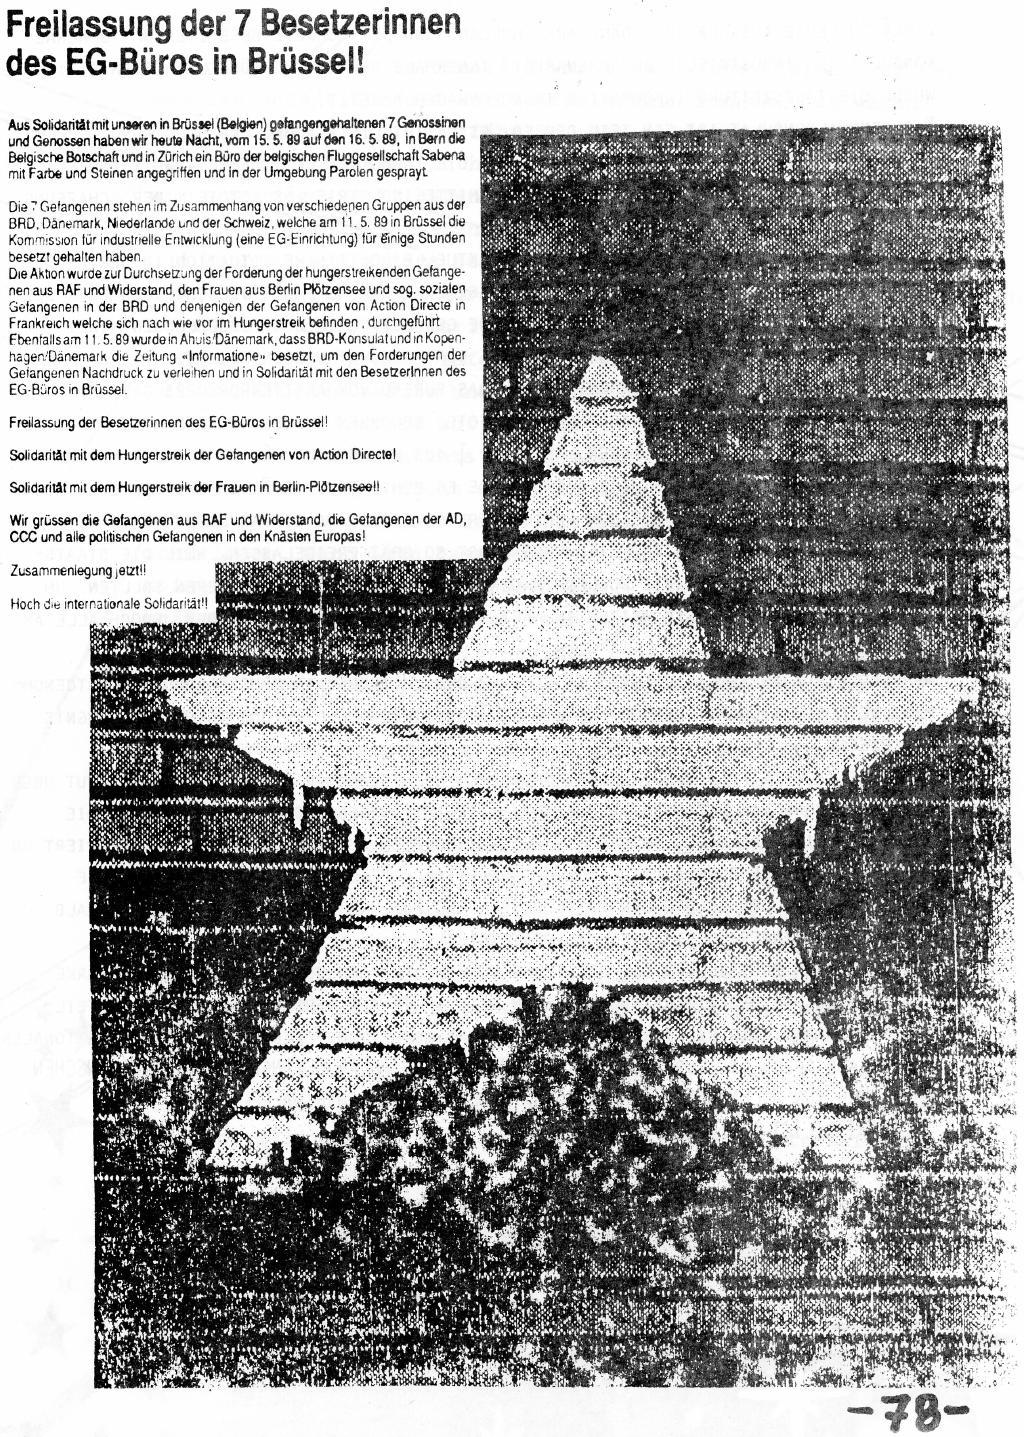 Belgien_Doku_Besetzung_EG_Kommission_1989_080